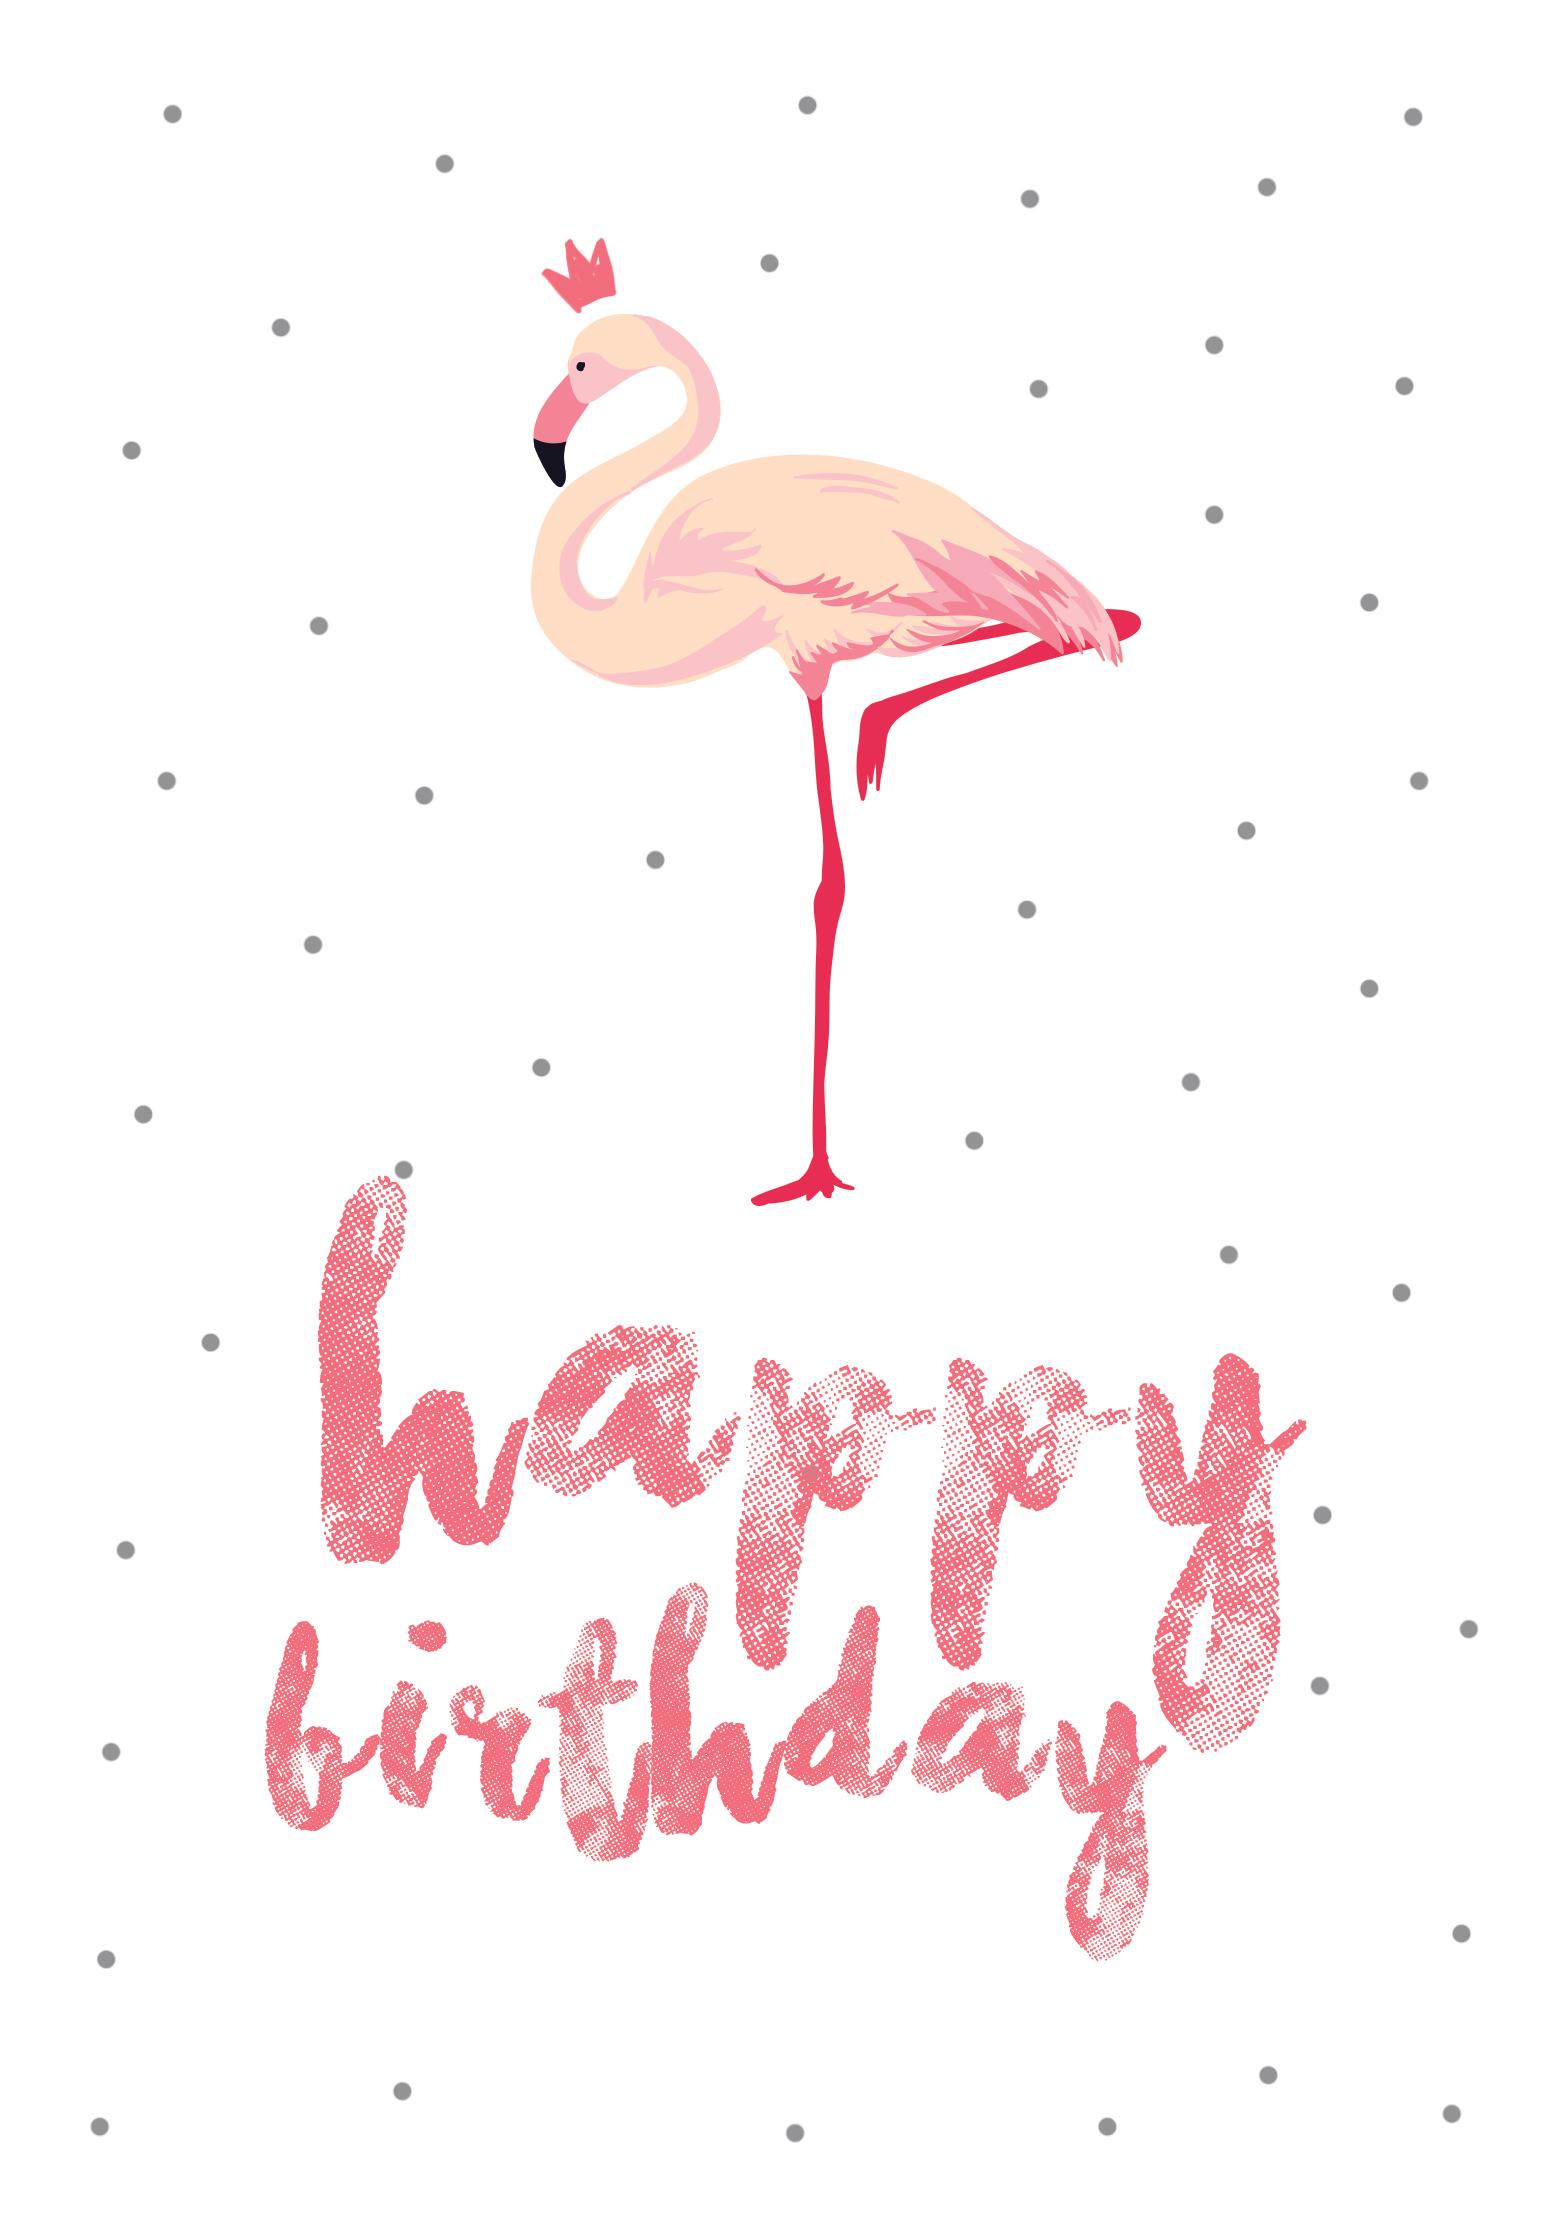 Flamingo Birthday - Free Printable Birthday Card   Greetings Island - Free Printable Thinking Of You Cards